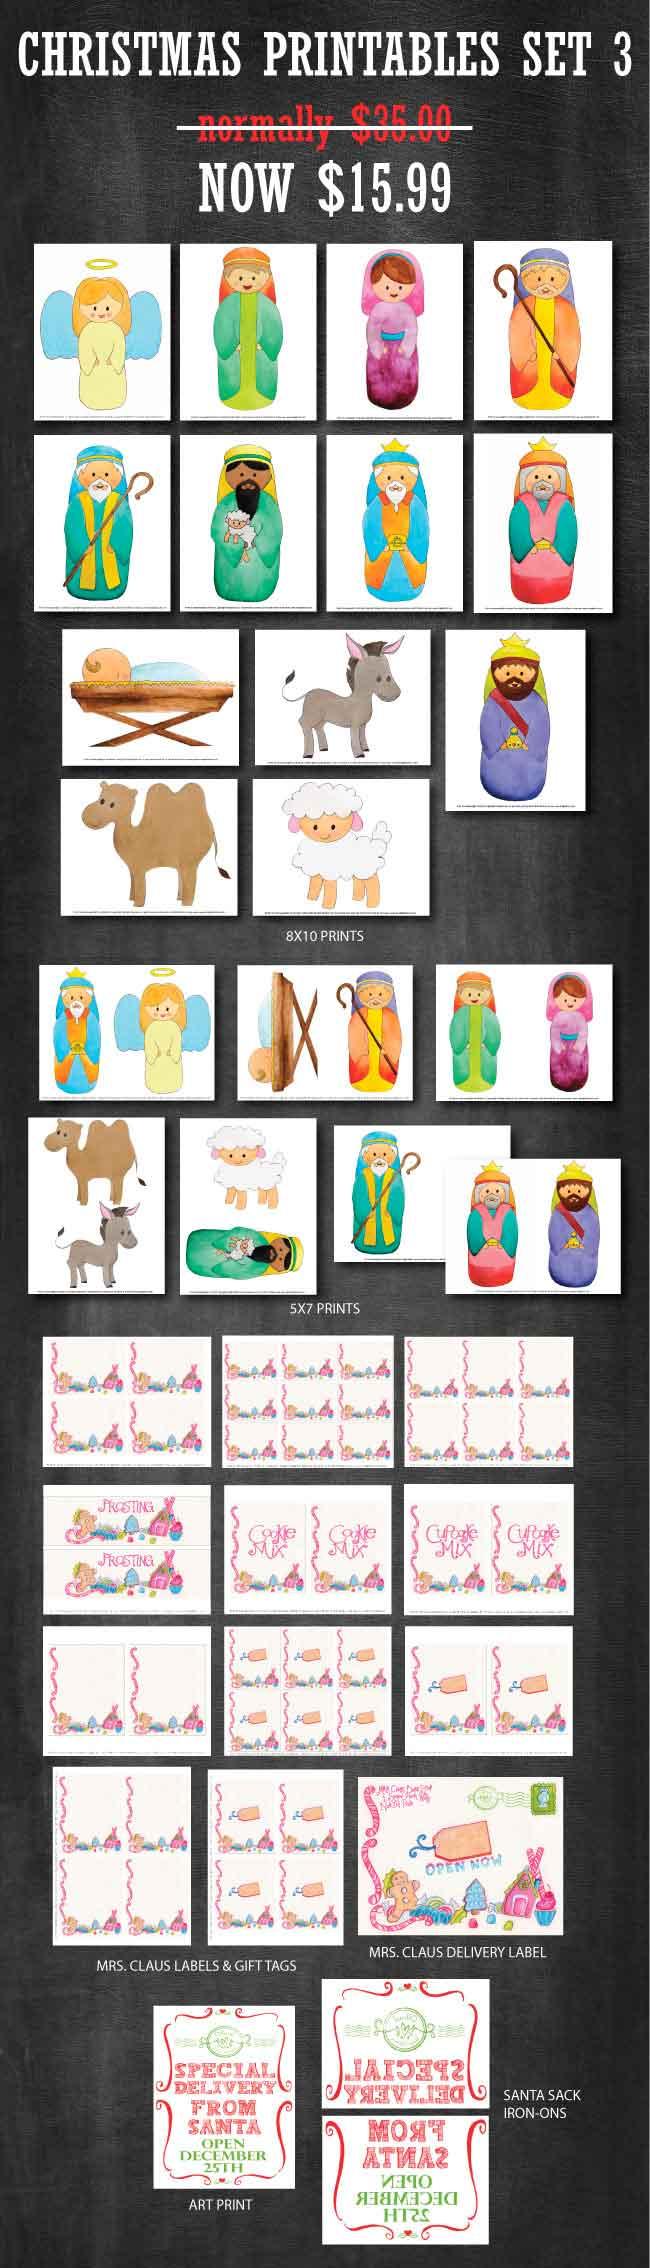 Design Dazzle Printable Set available at www.designdazzle.com